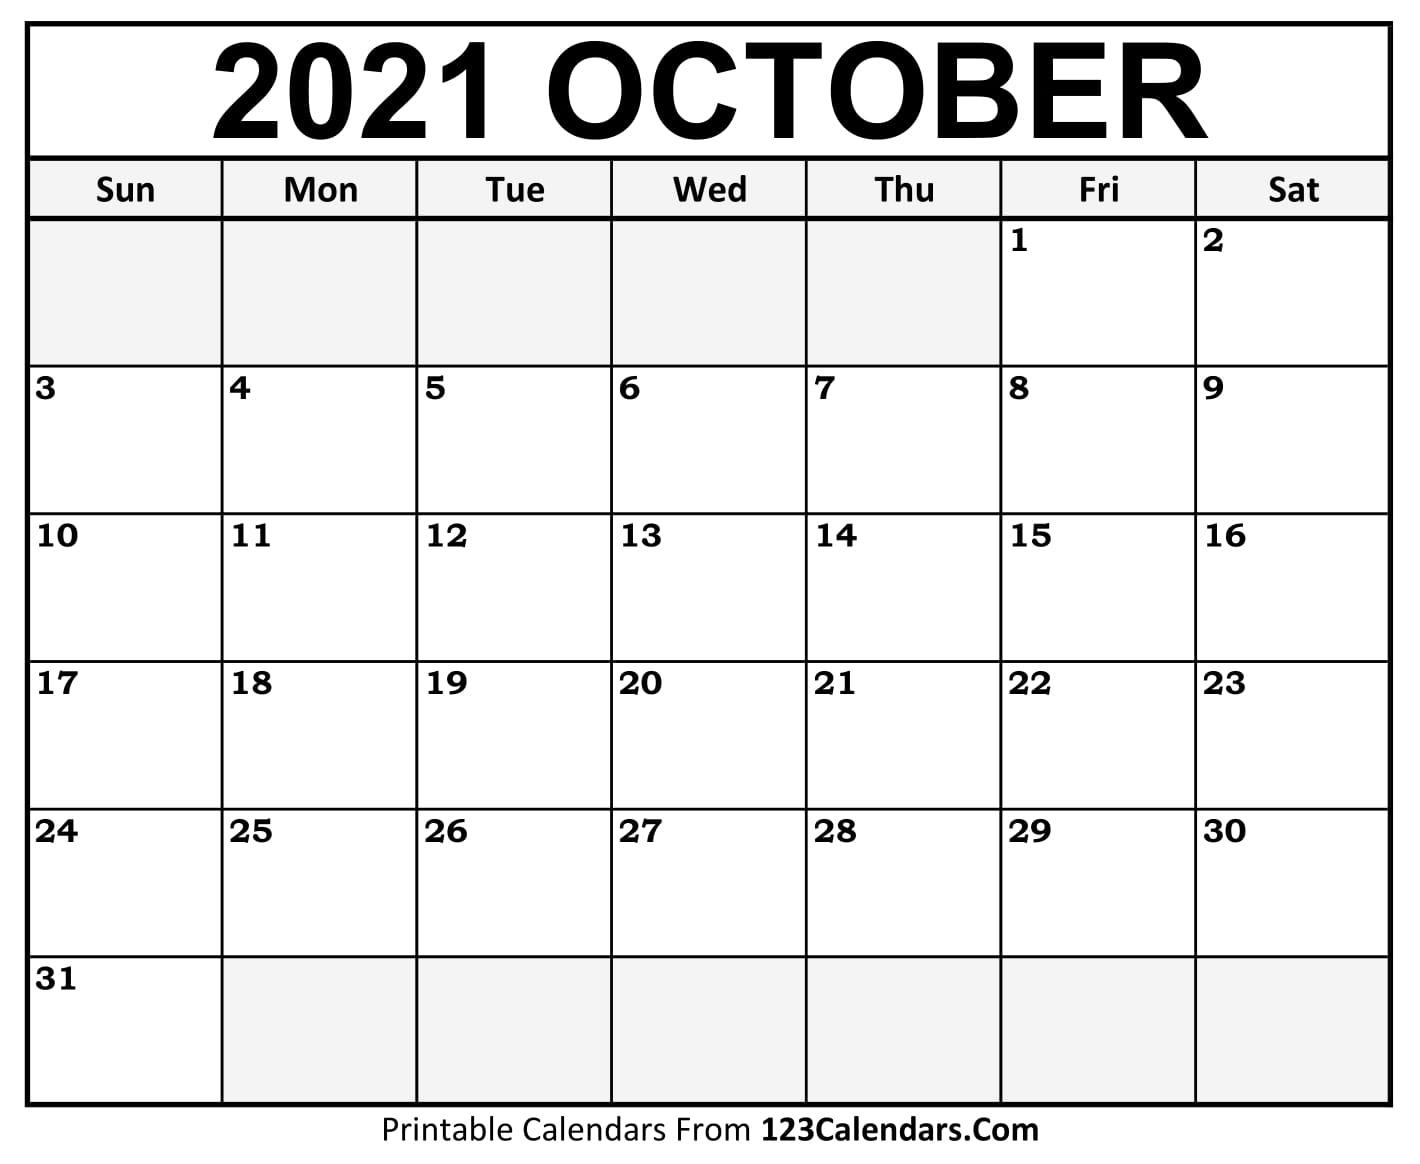 Printable October 2021 Calendar Templates | 123Calendars